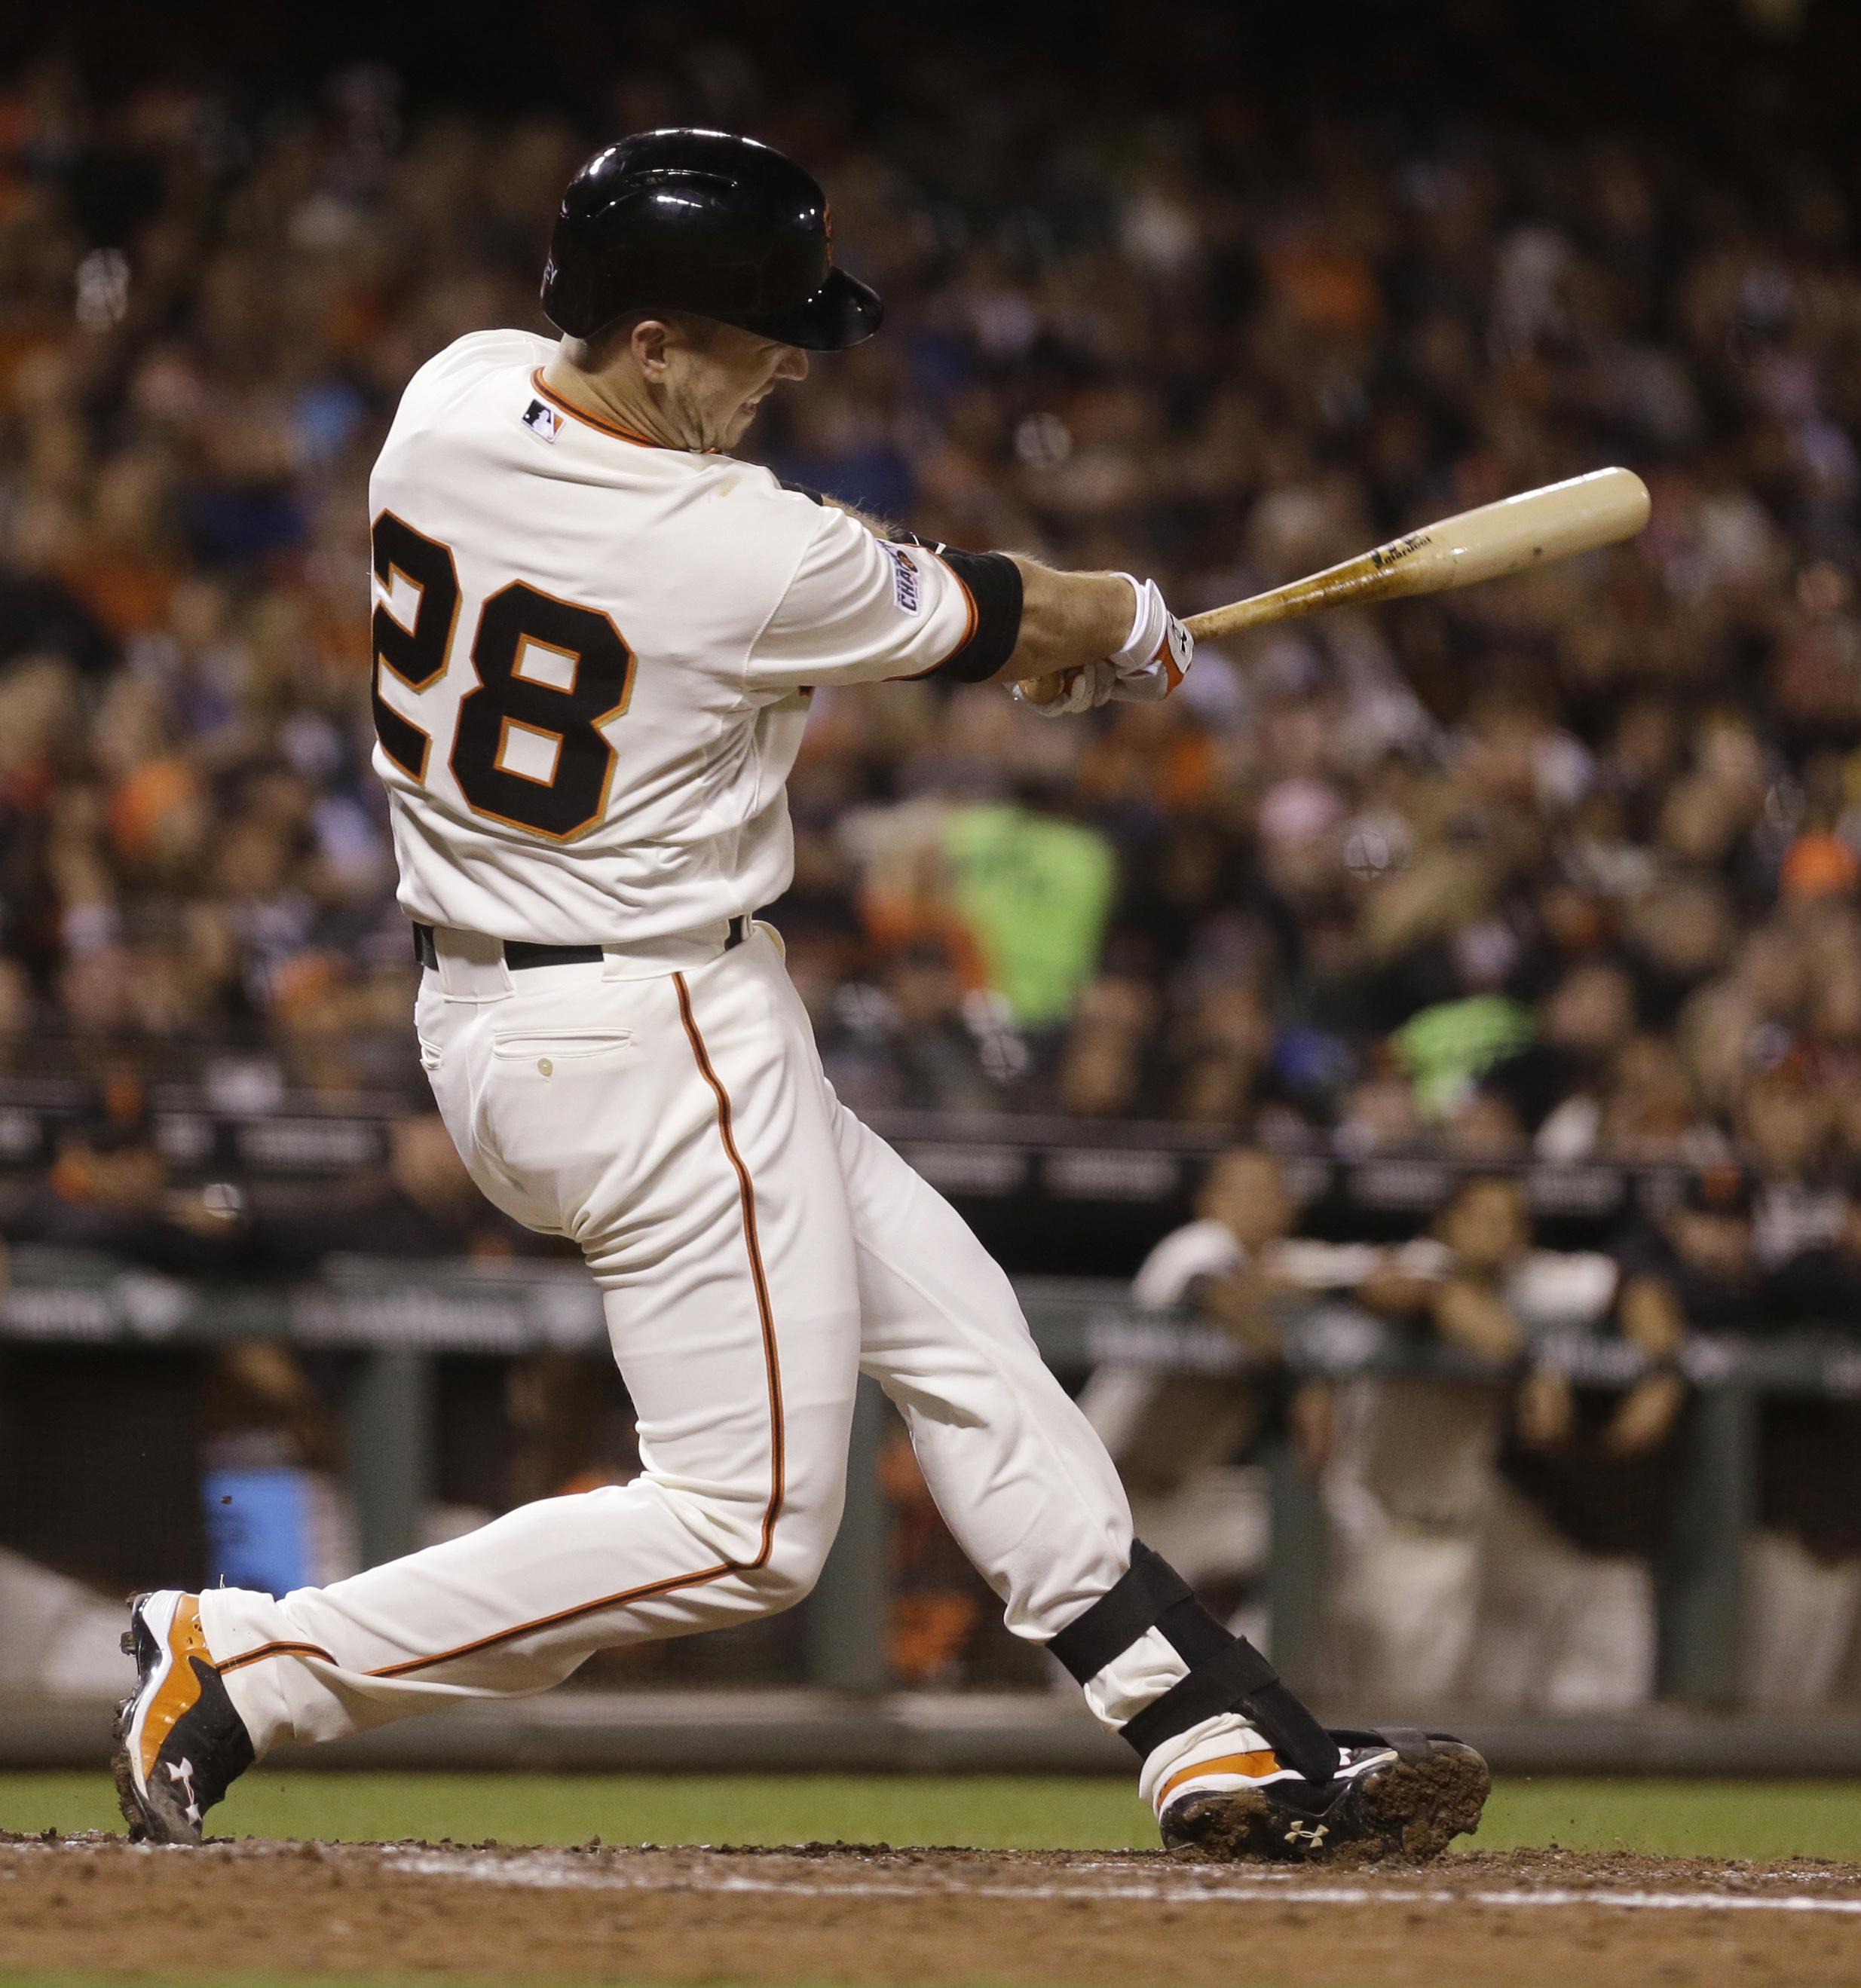 San Francisco Giants' Buster Posey follows through on a three-run home run off Cincinnati Reds' John Lamb during the fourth inning of a baseball game Tuesday, Sept. 15, 2015, in San Francisco. (AP Photo/Ben Margot)